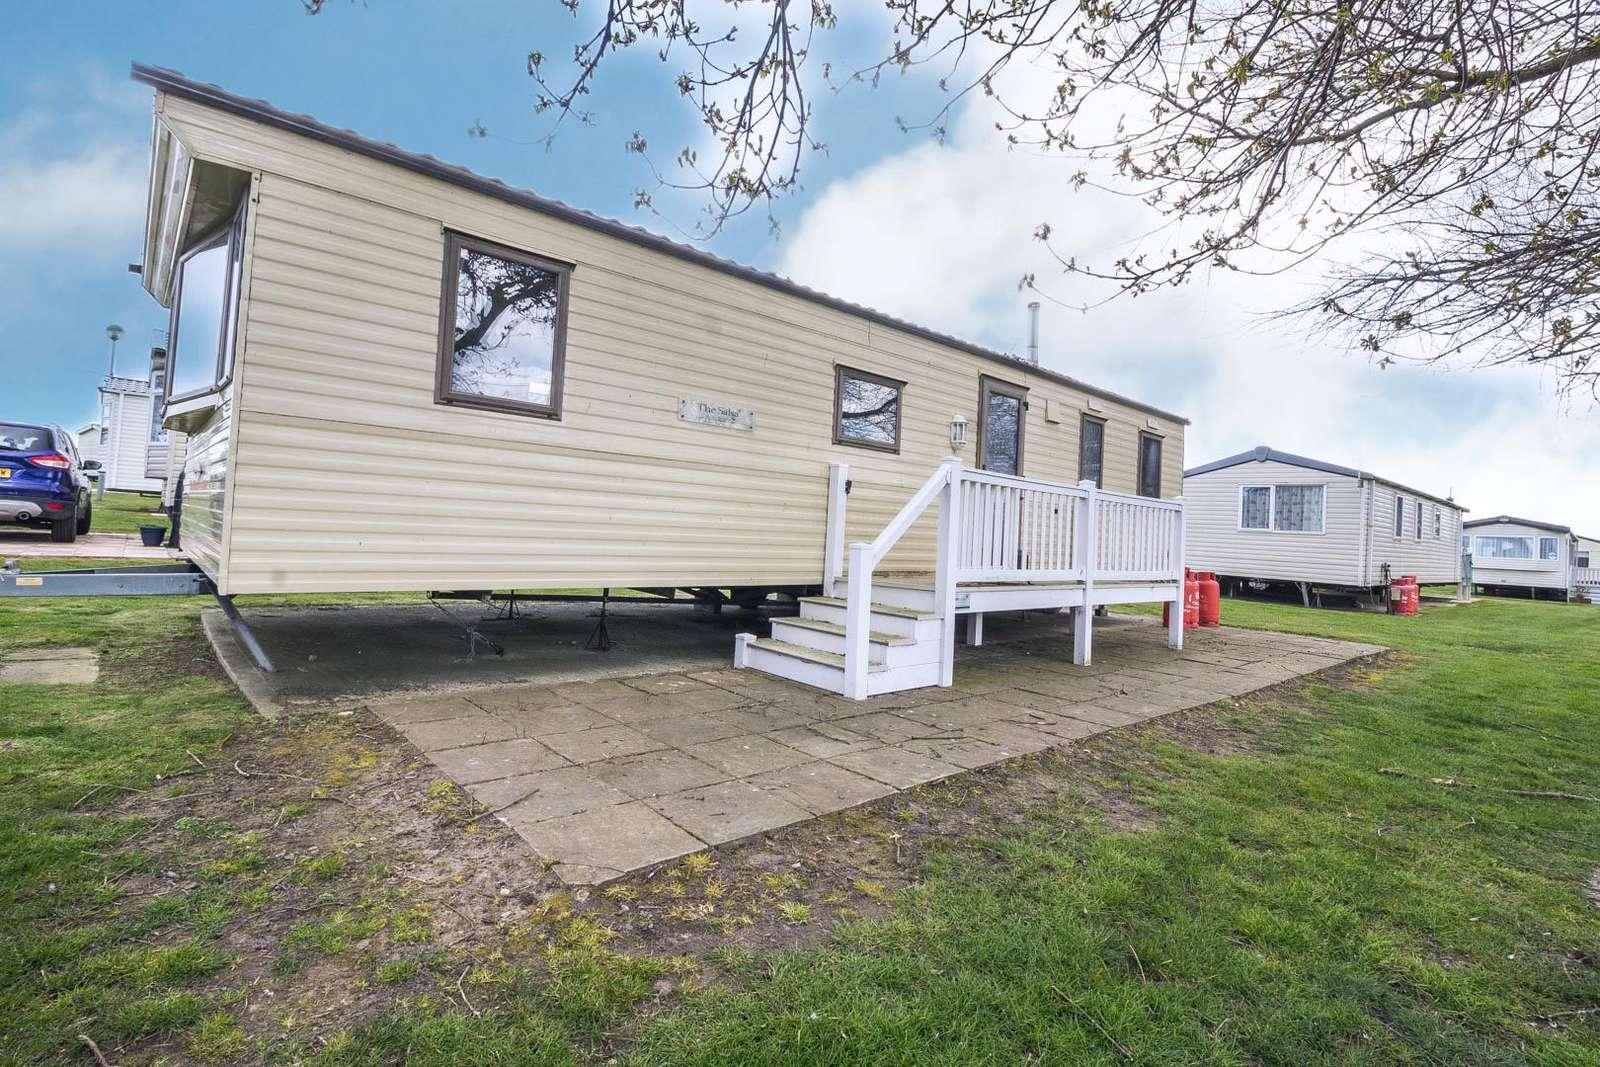 80014G – Greenways area, 3 bed, 8 berth caravan. Emerald rated. - property